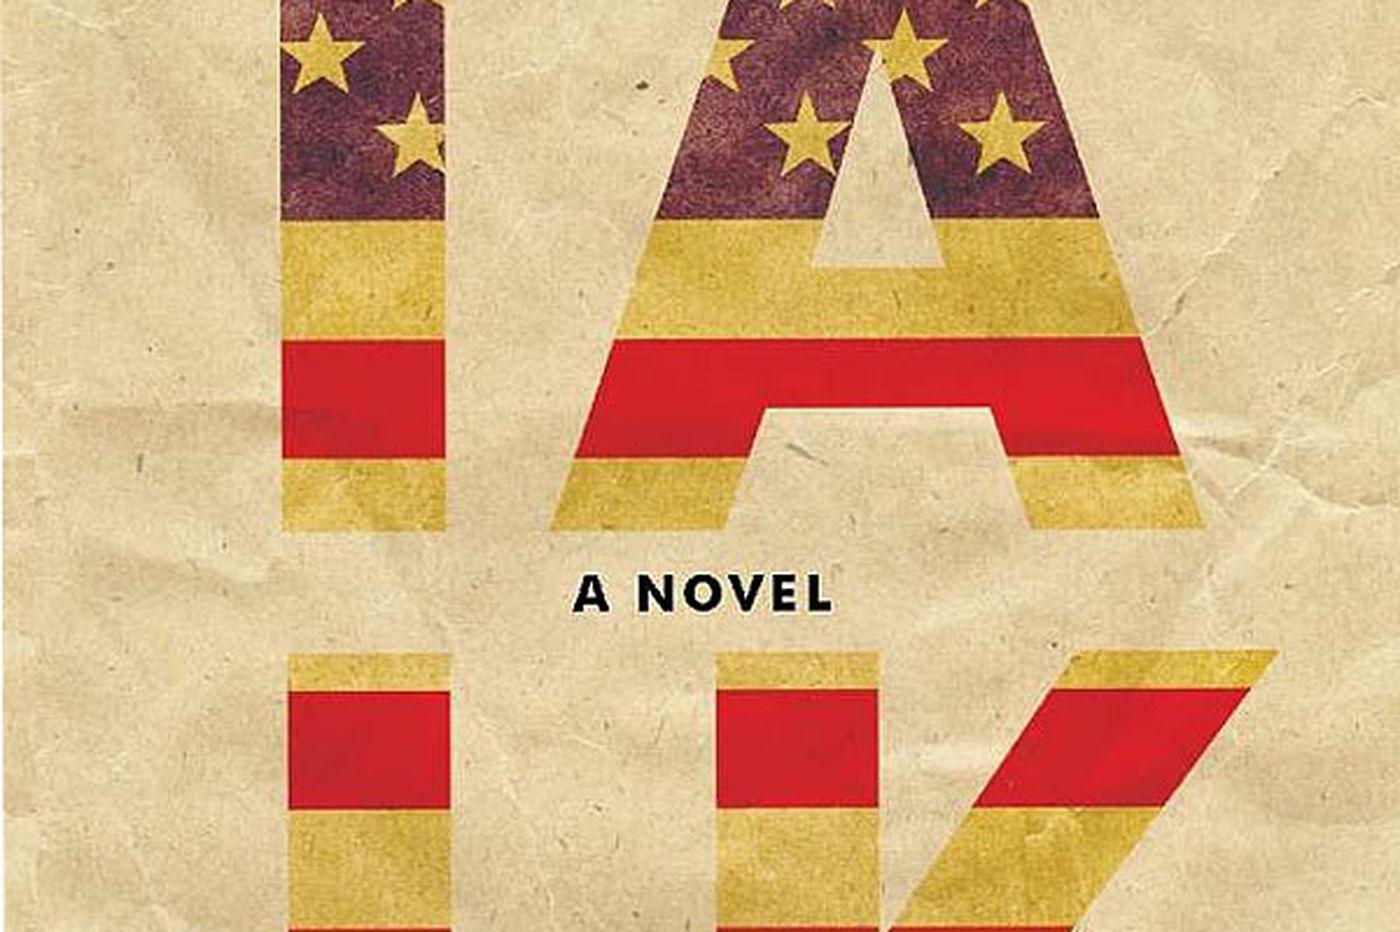 A talker's foray into fiction